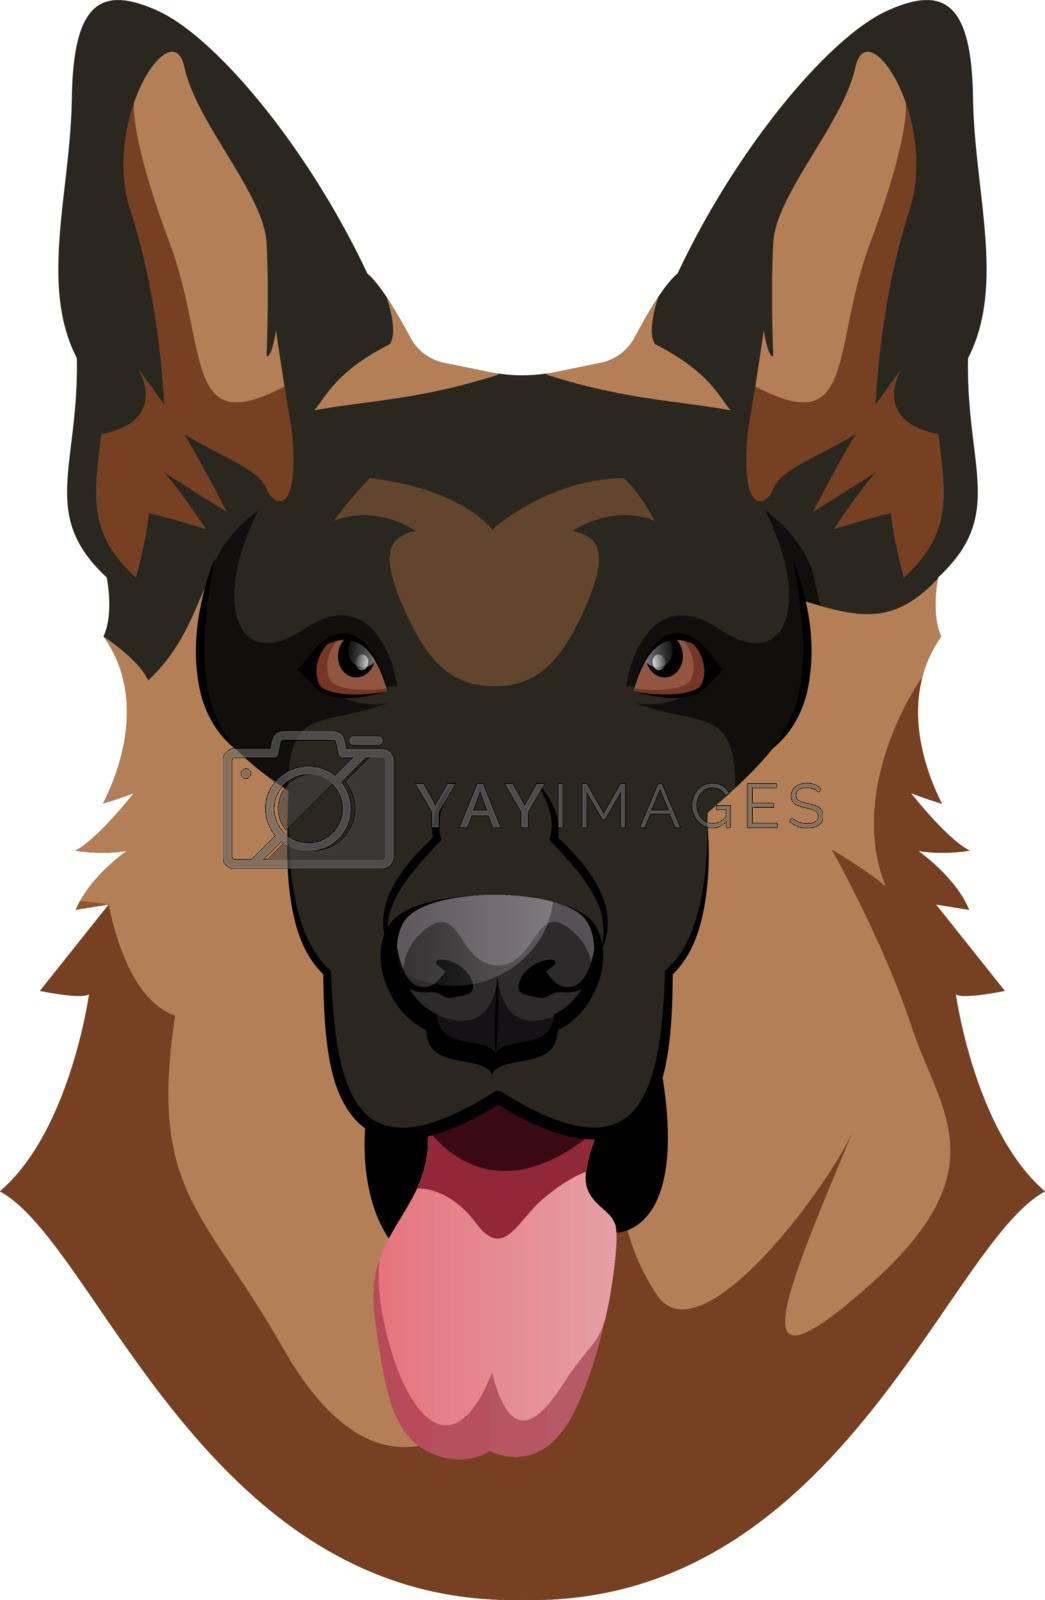 Royalty free image of German Shepherd illustration vector on white background by Morphart